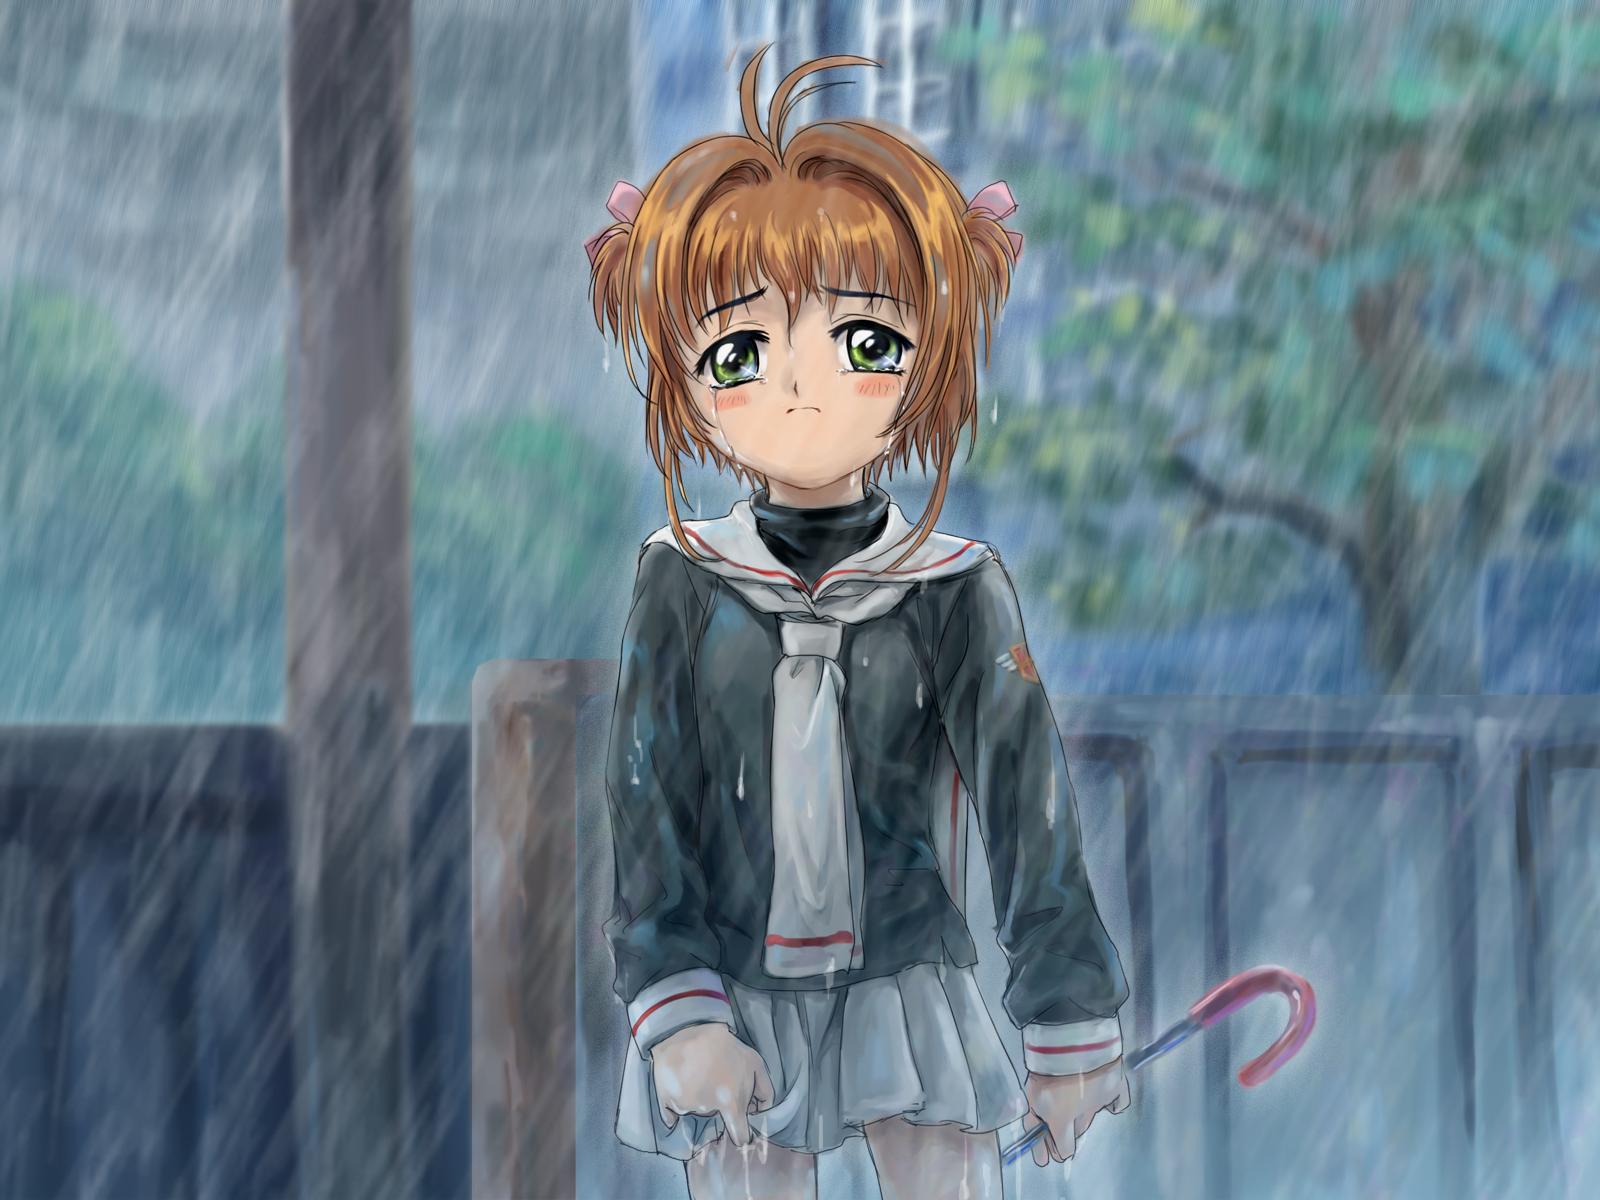 card_captor_sakura crying kinomoto_sakura moonknives rain school_uniform water